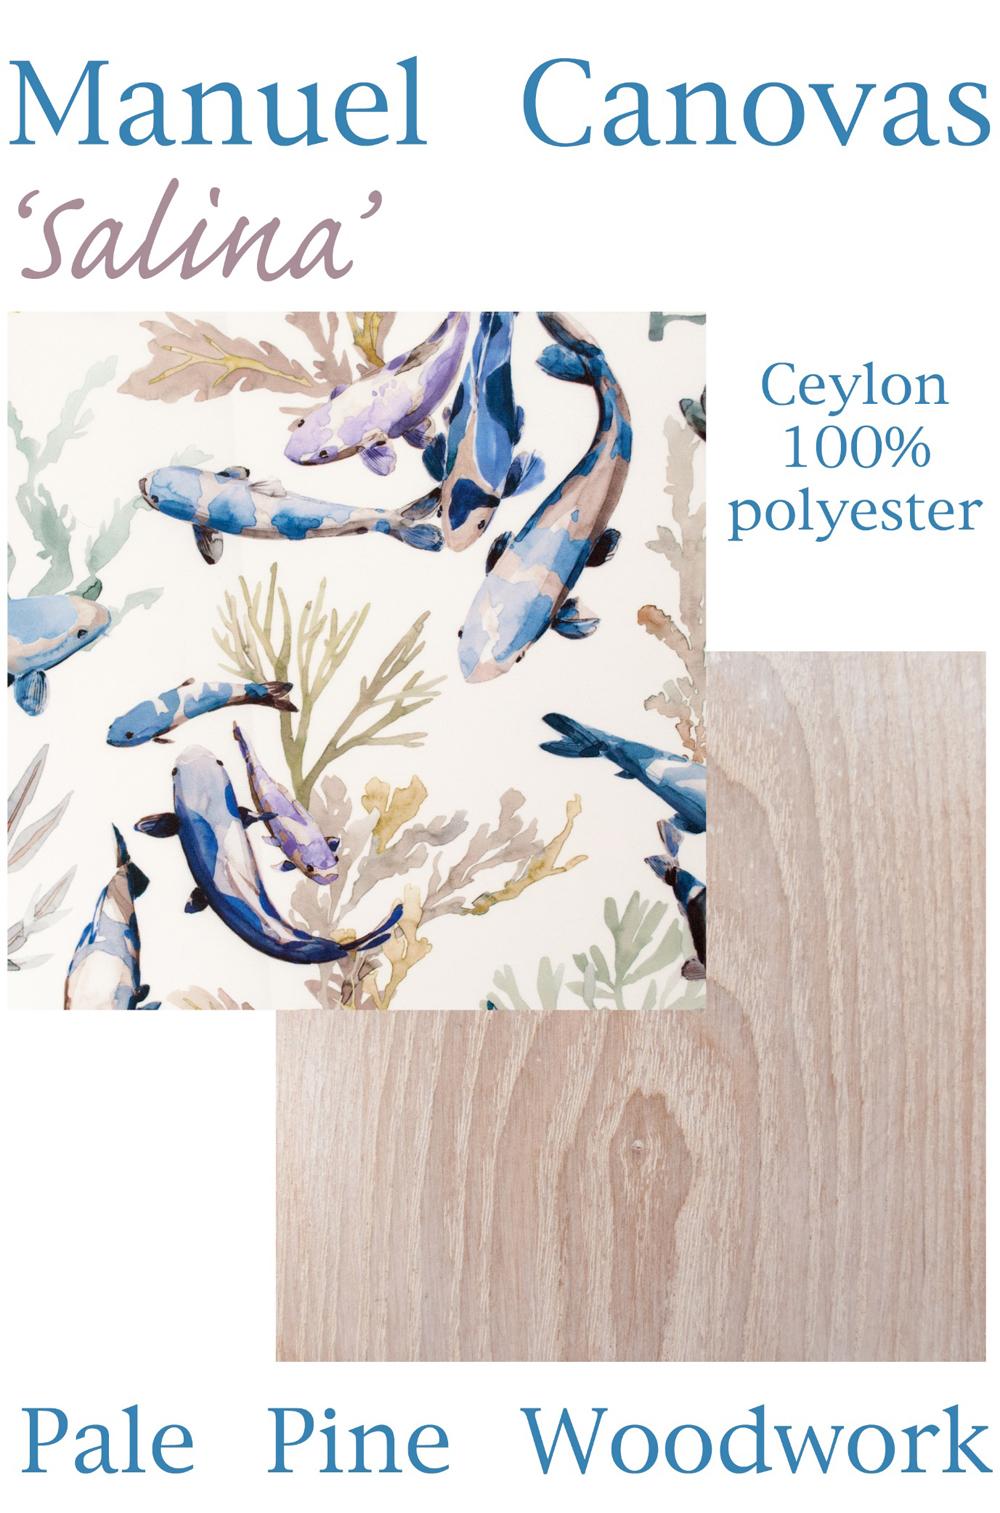 Jenny Blanc Blog - Manuel Canovas Fabrics